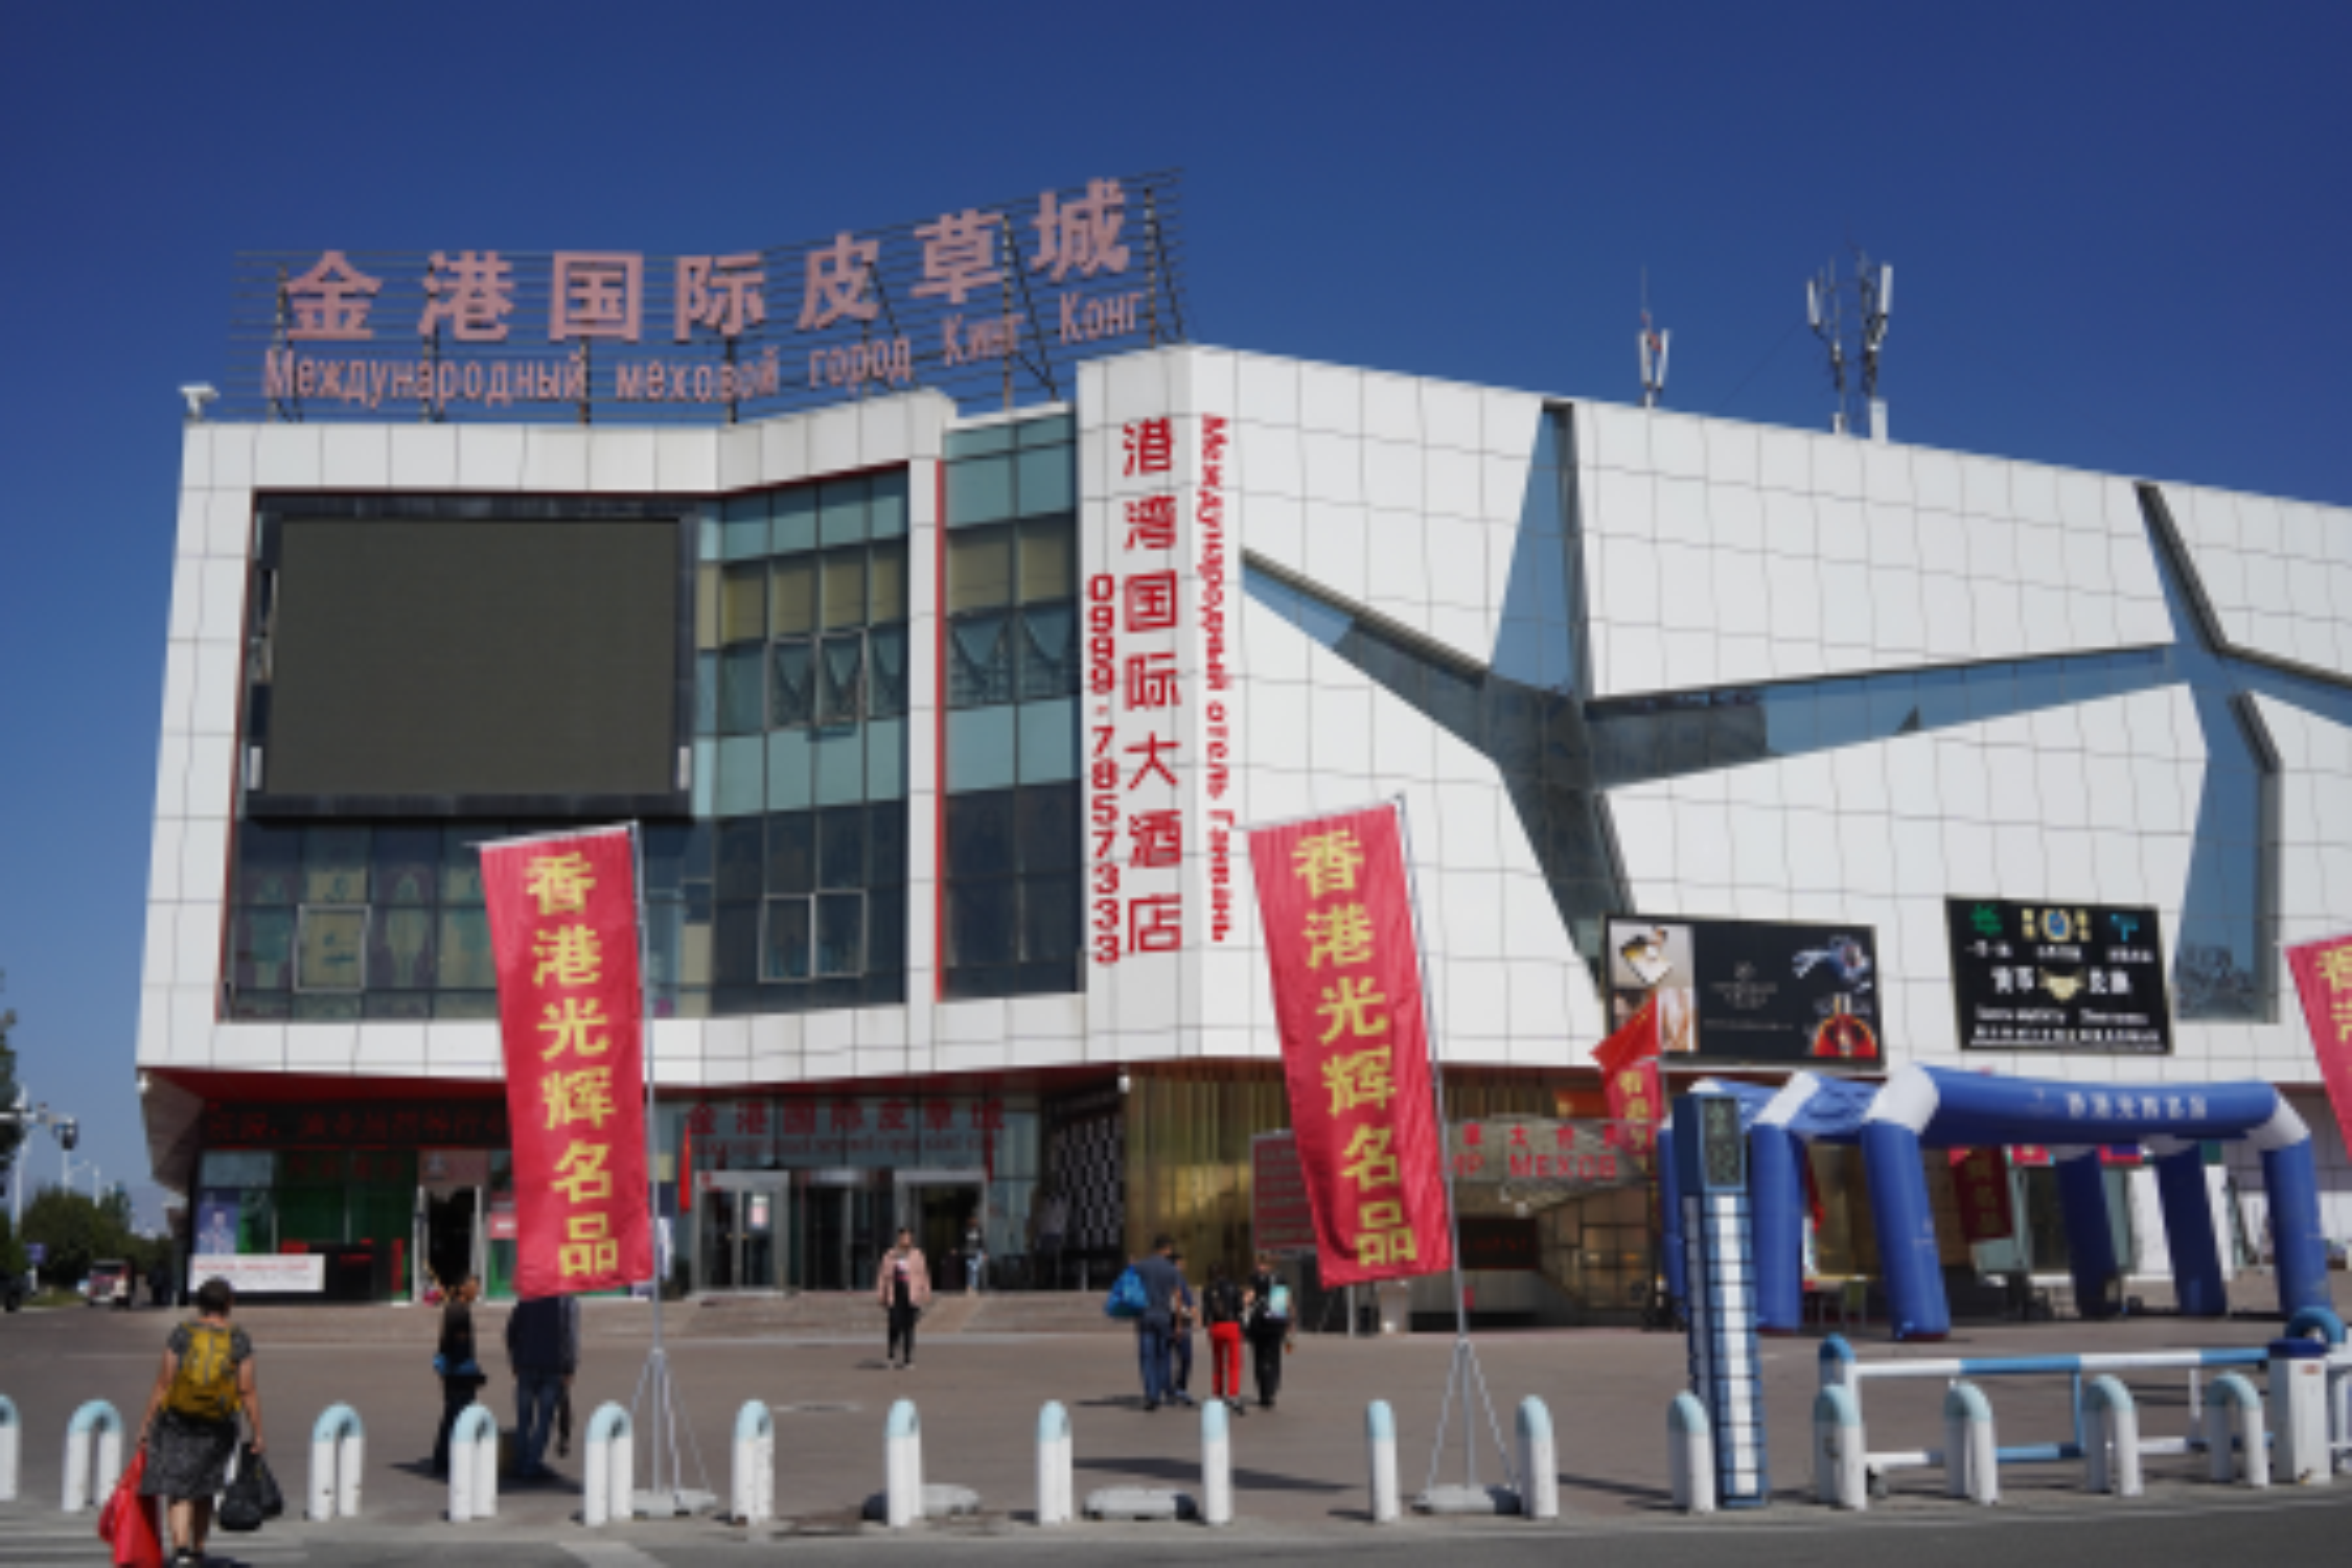 The King Kong Fur Coat mall in Khorgos